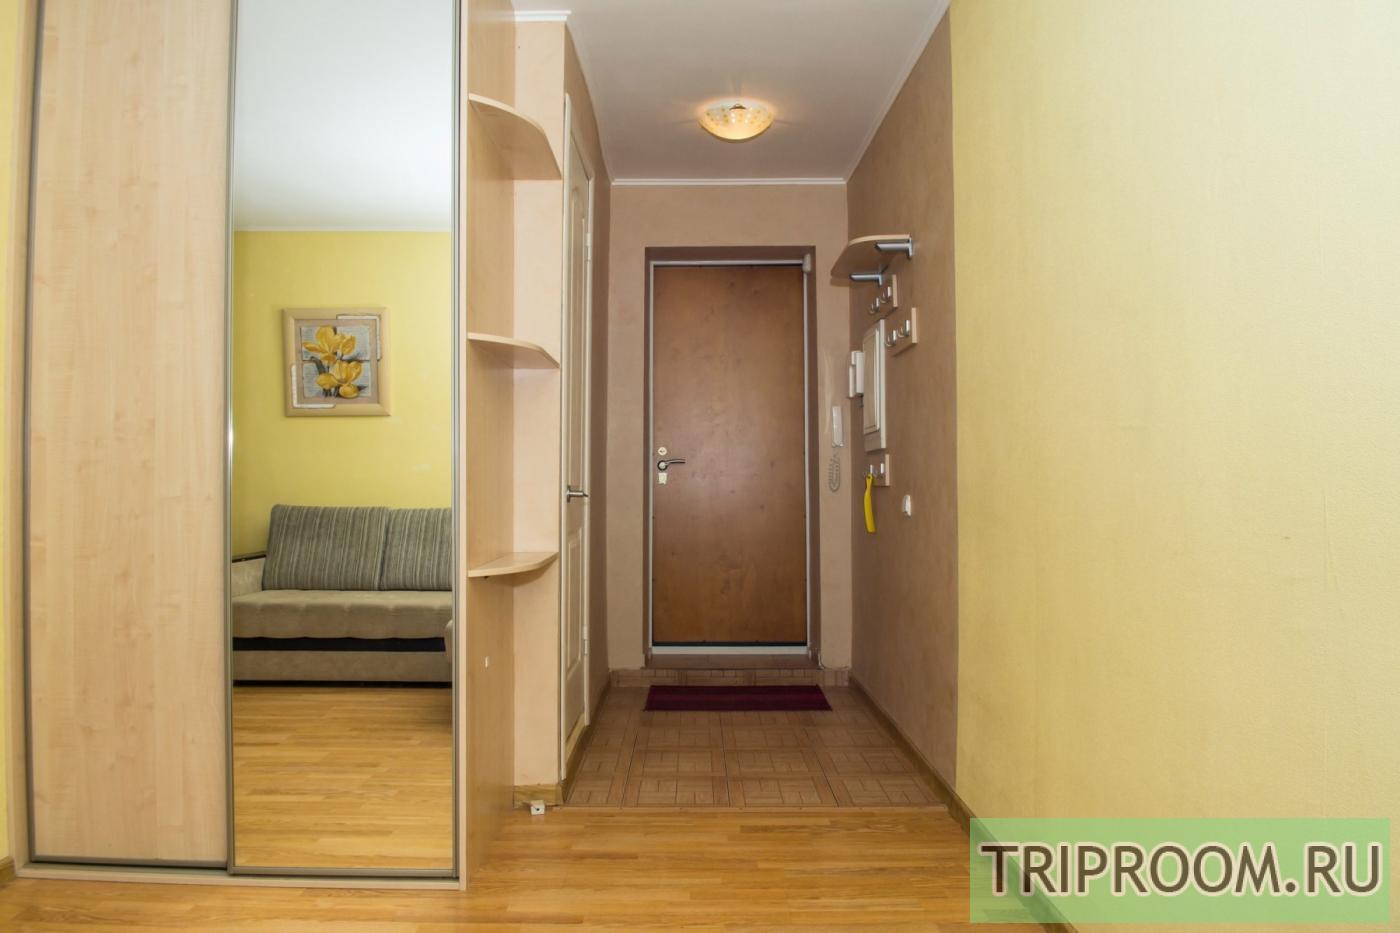 2-комнатная квартира посуточно (вариант № 20494), ул. Газеты звезда, фото № 6